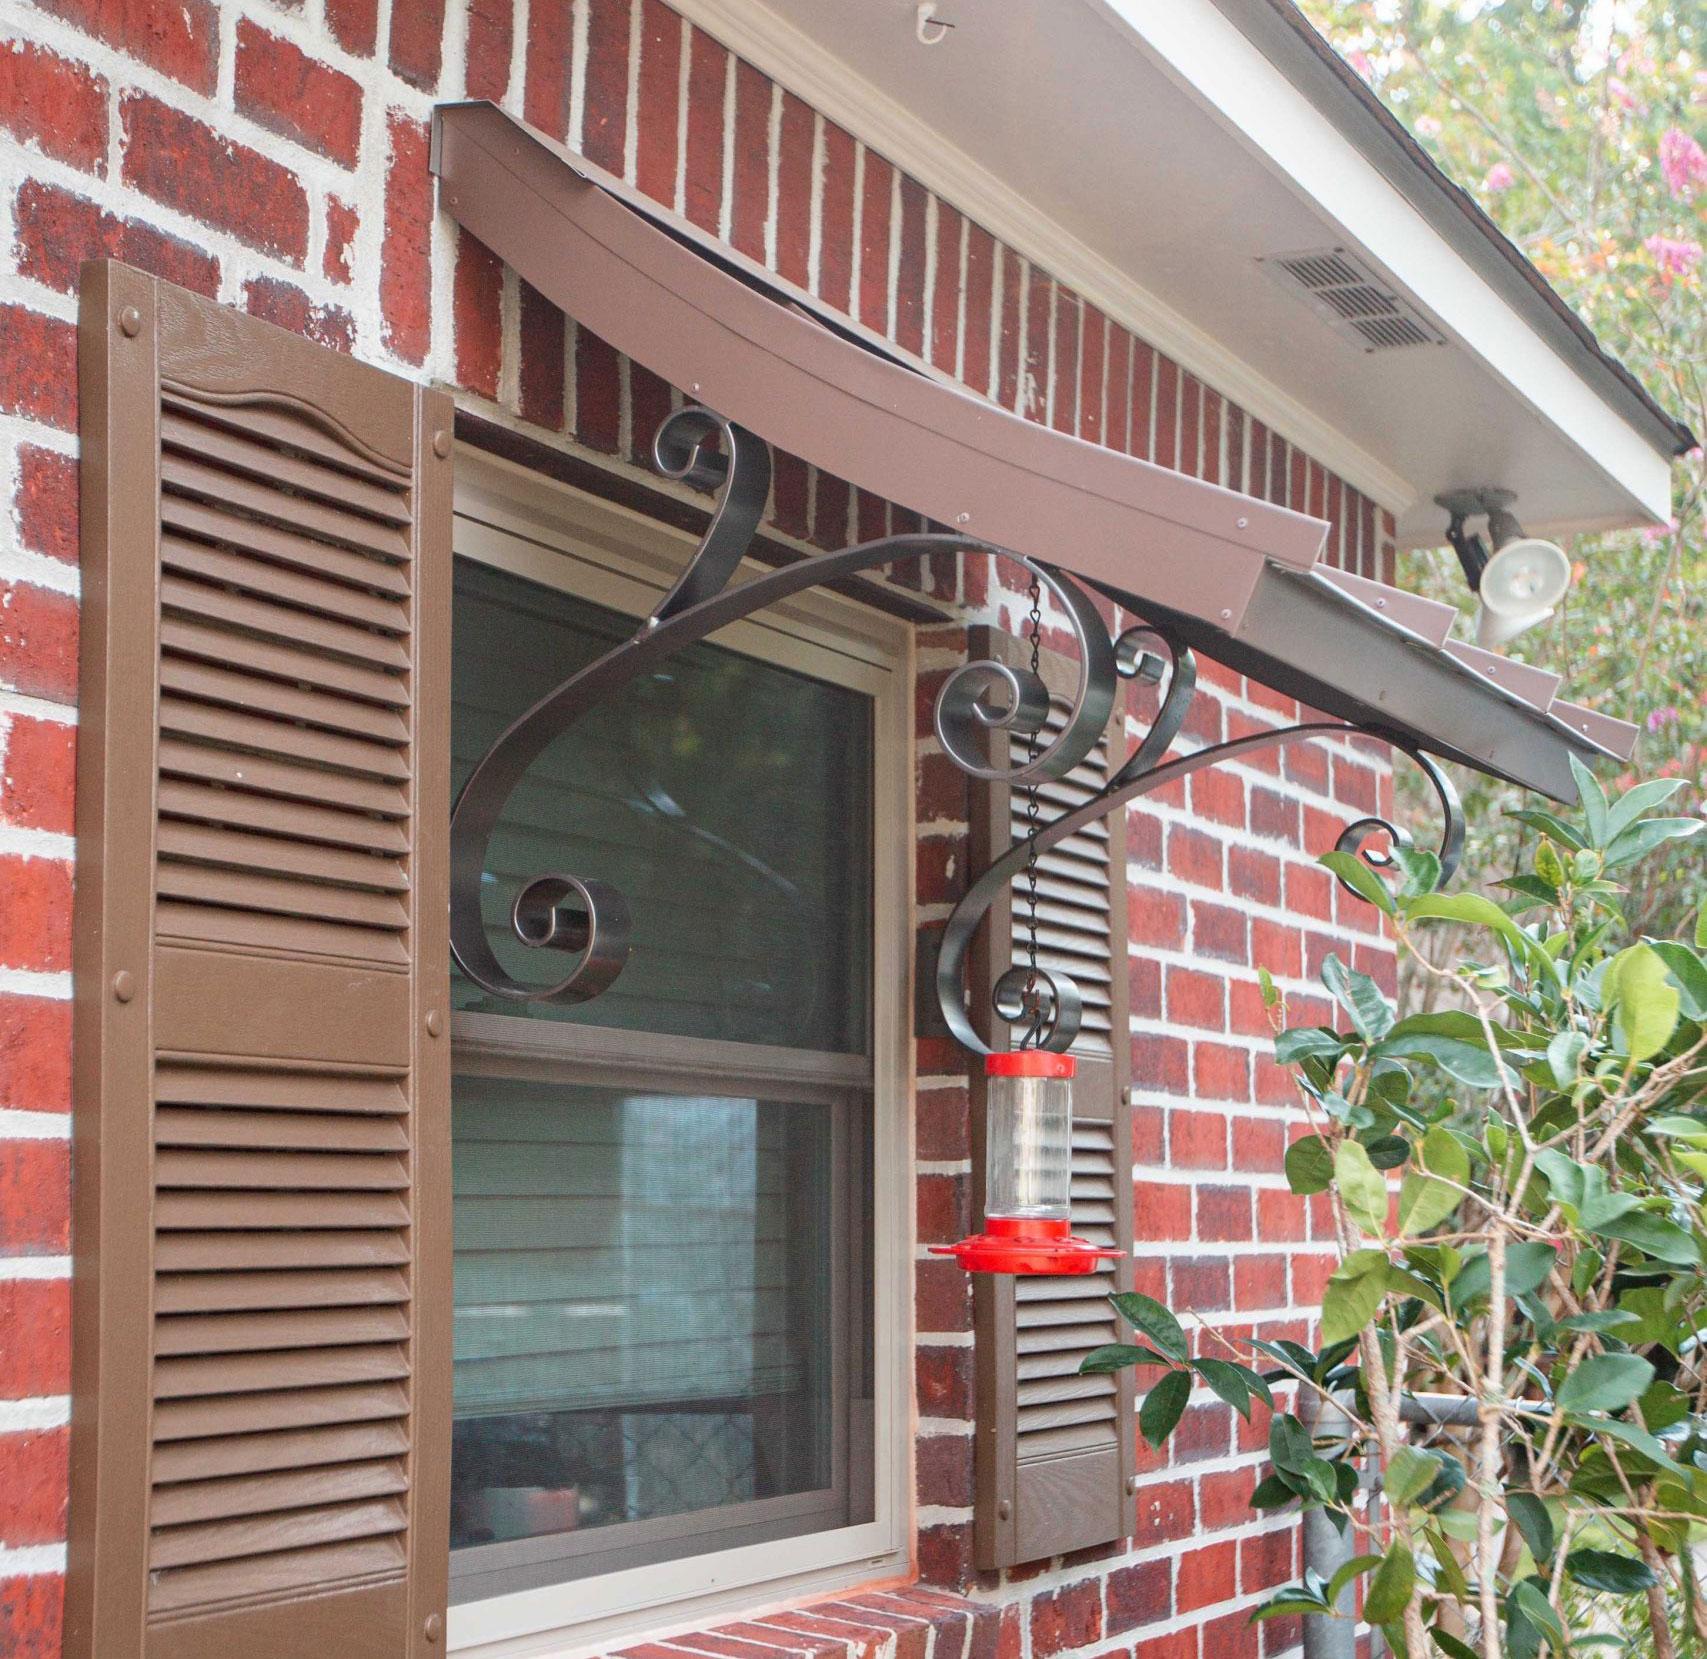 Awning-World-Metal awnings-Fabric Awnings-Copper Awnings-Canvas Awnings-Custom Awnings-Residential Awnings-Commercial Awnings-Louisiana-Ships-to-the-United-States-Residential-Awnings-Commercial-Awnings